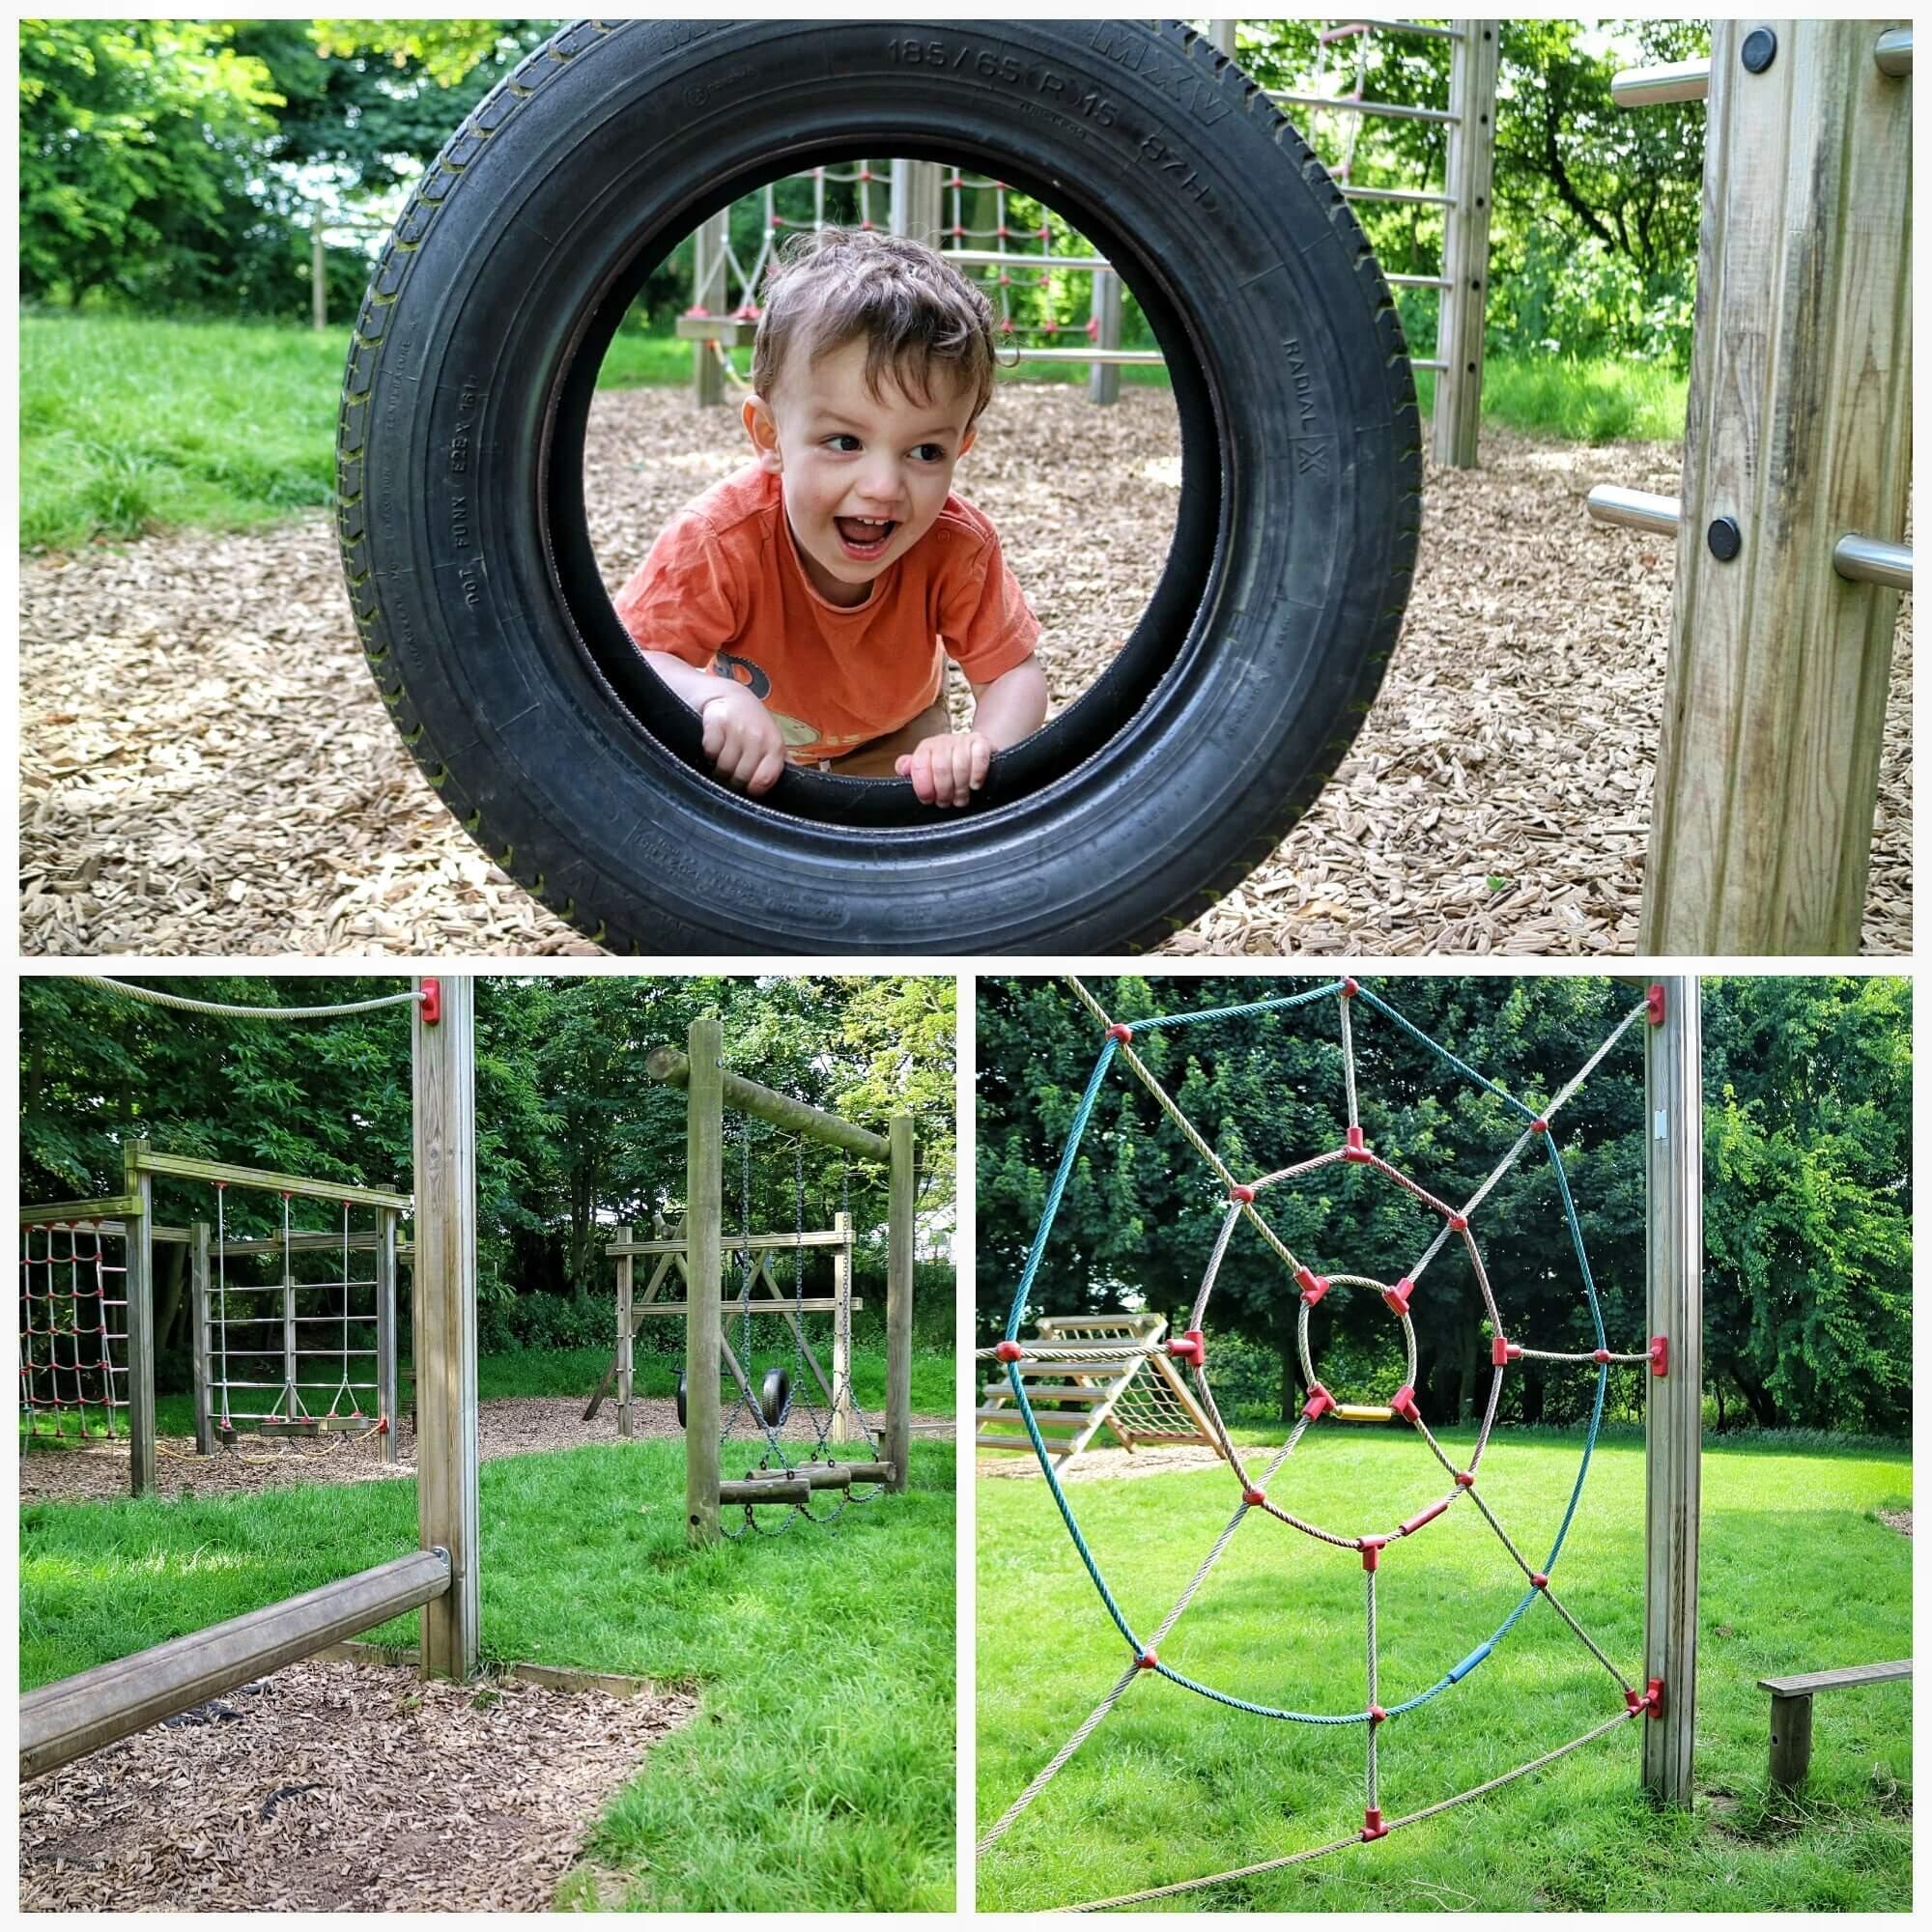 A toddler enjoying a play area